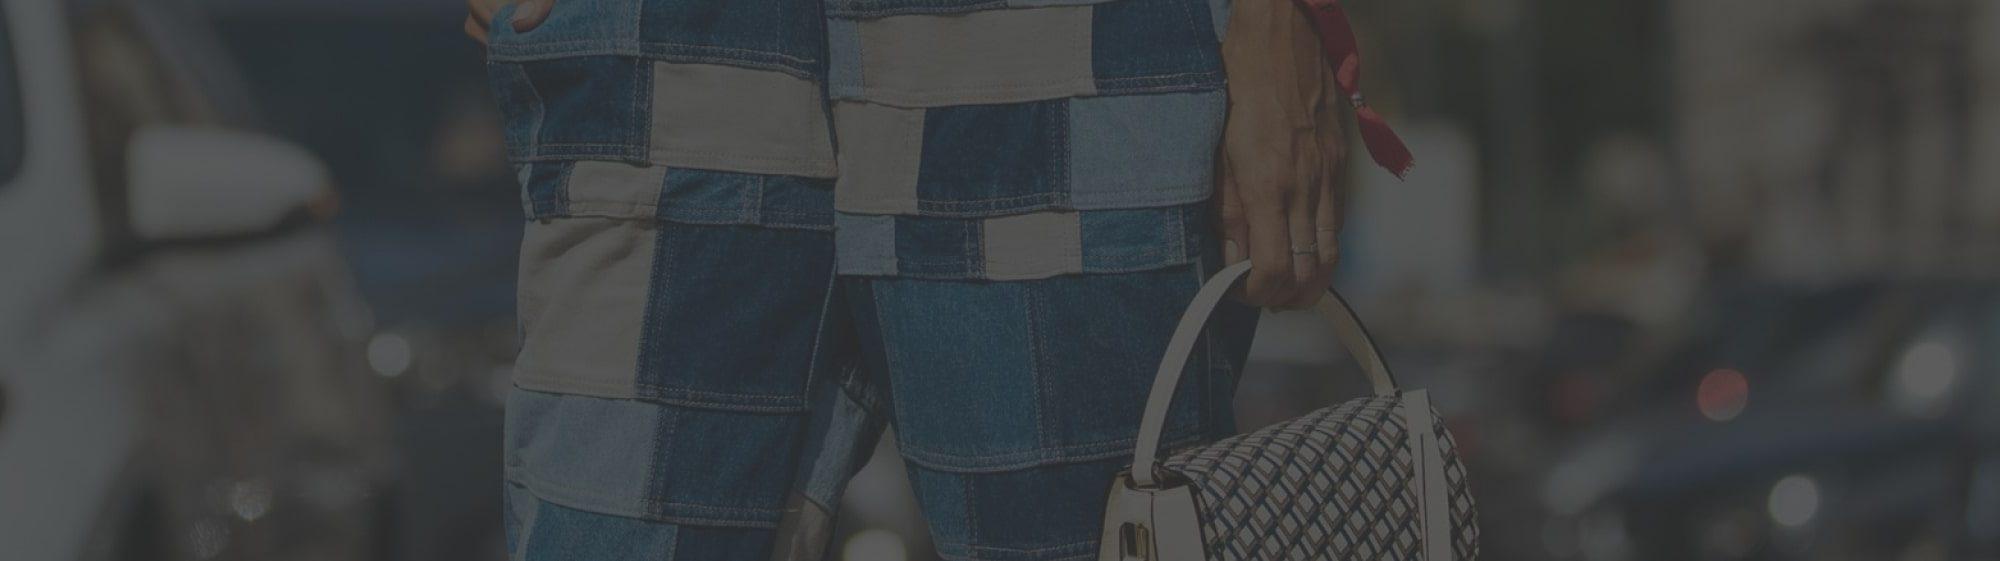 manzara_fashion_banner